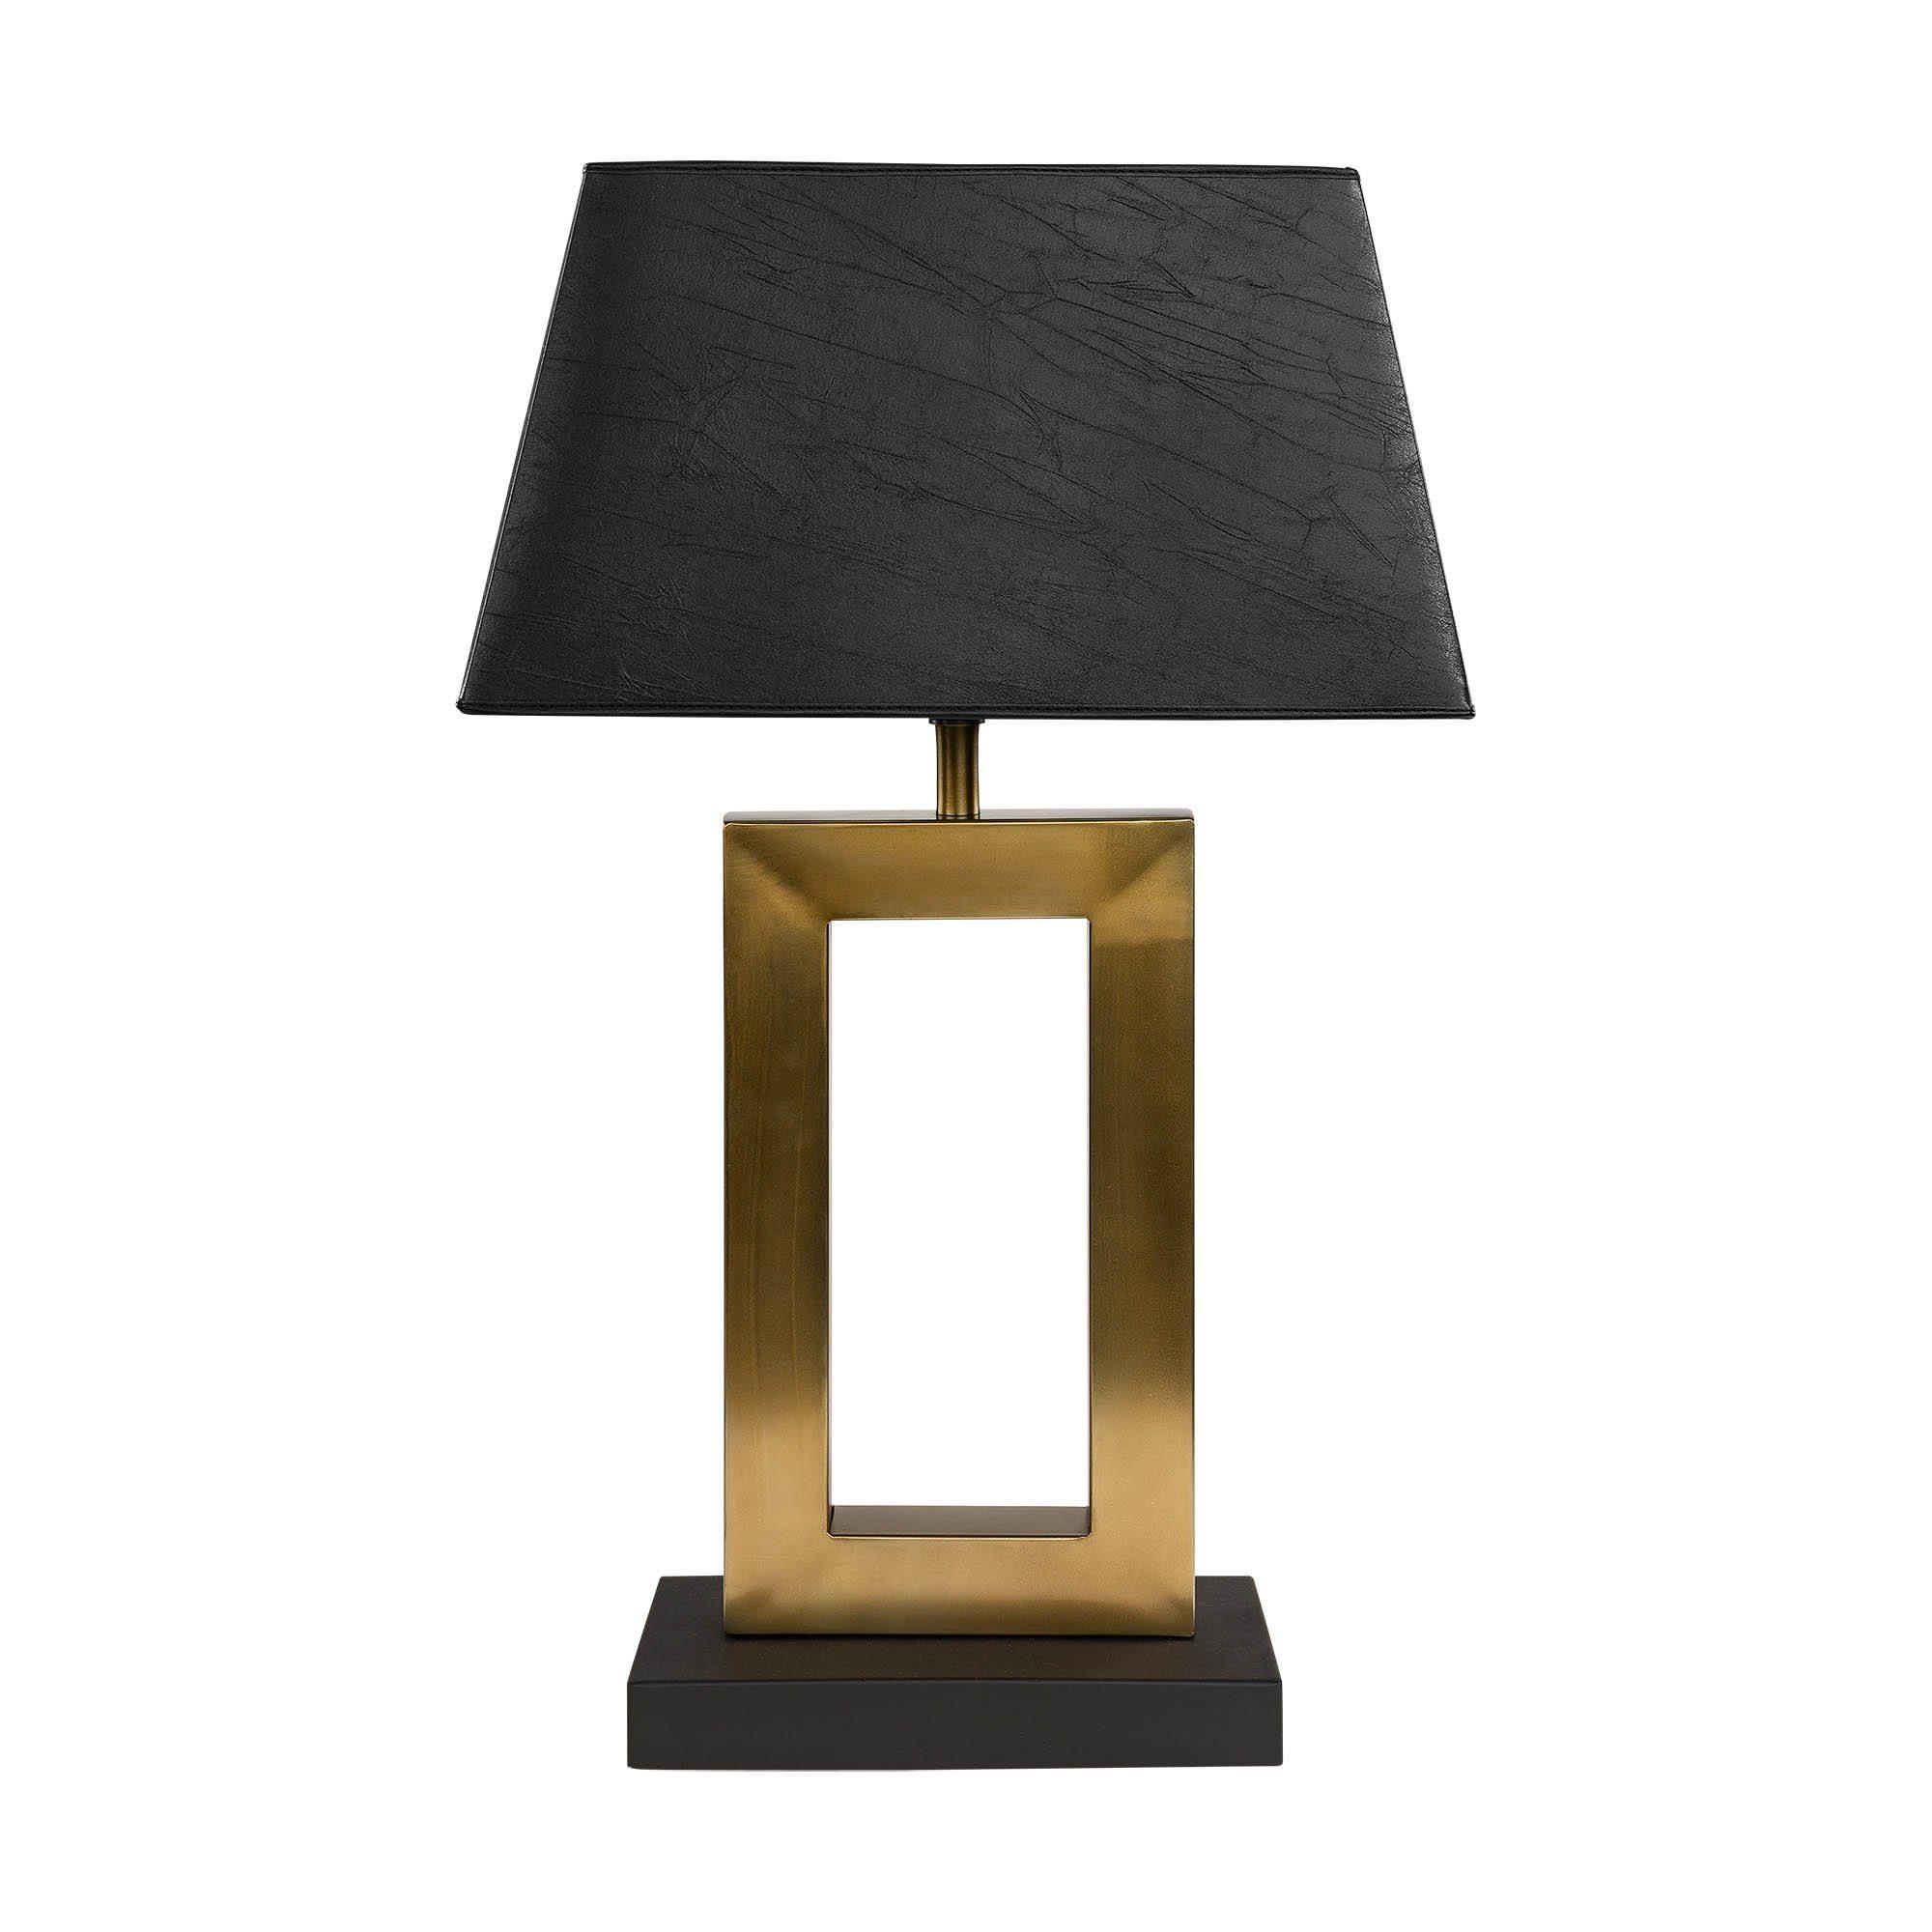 Arezzo bordslampafrån Artwood.